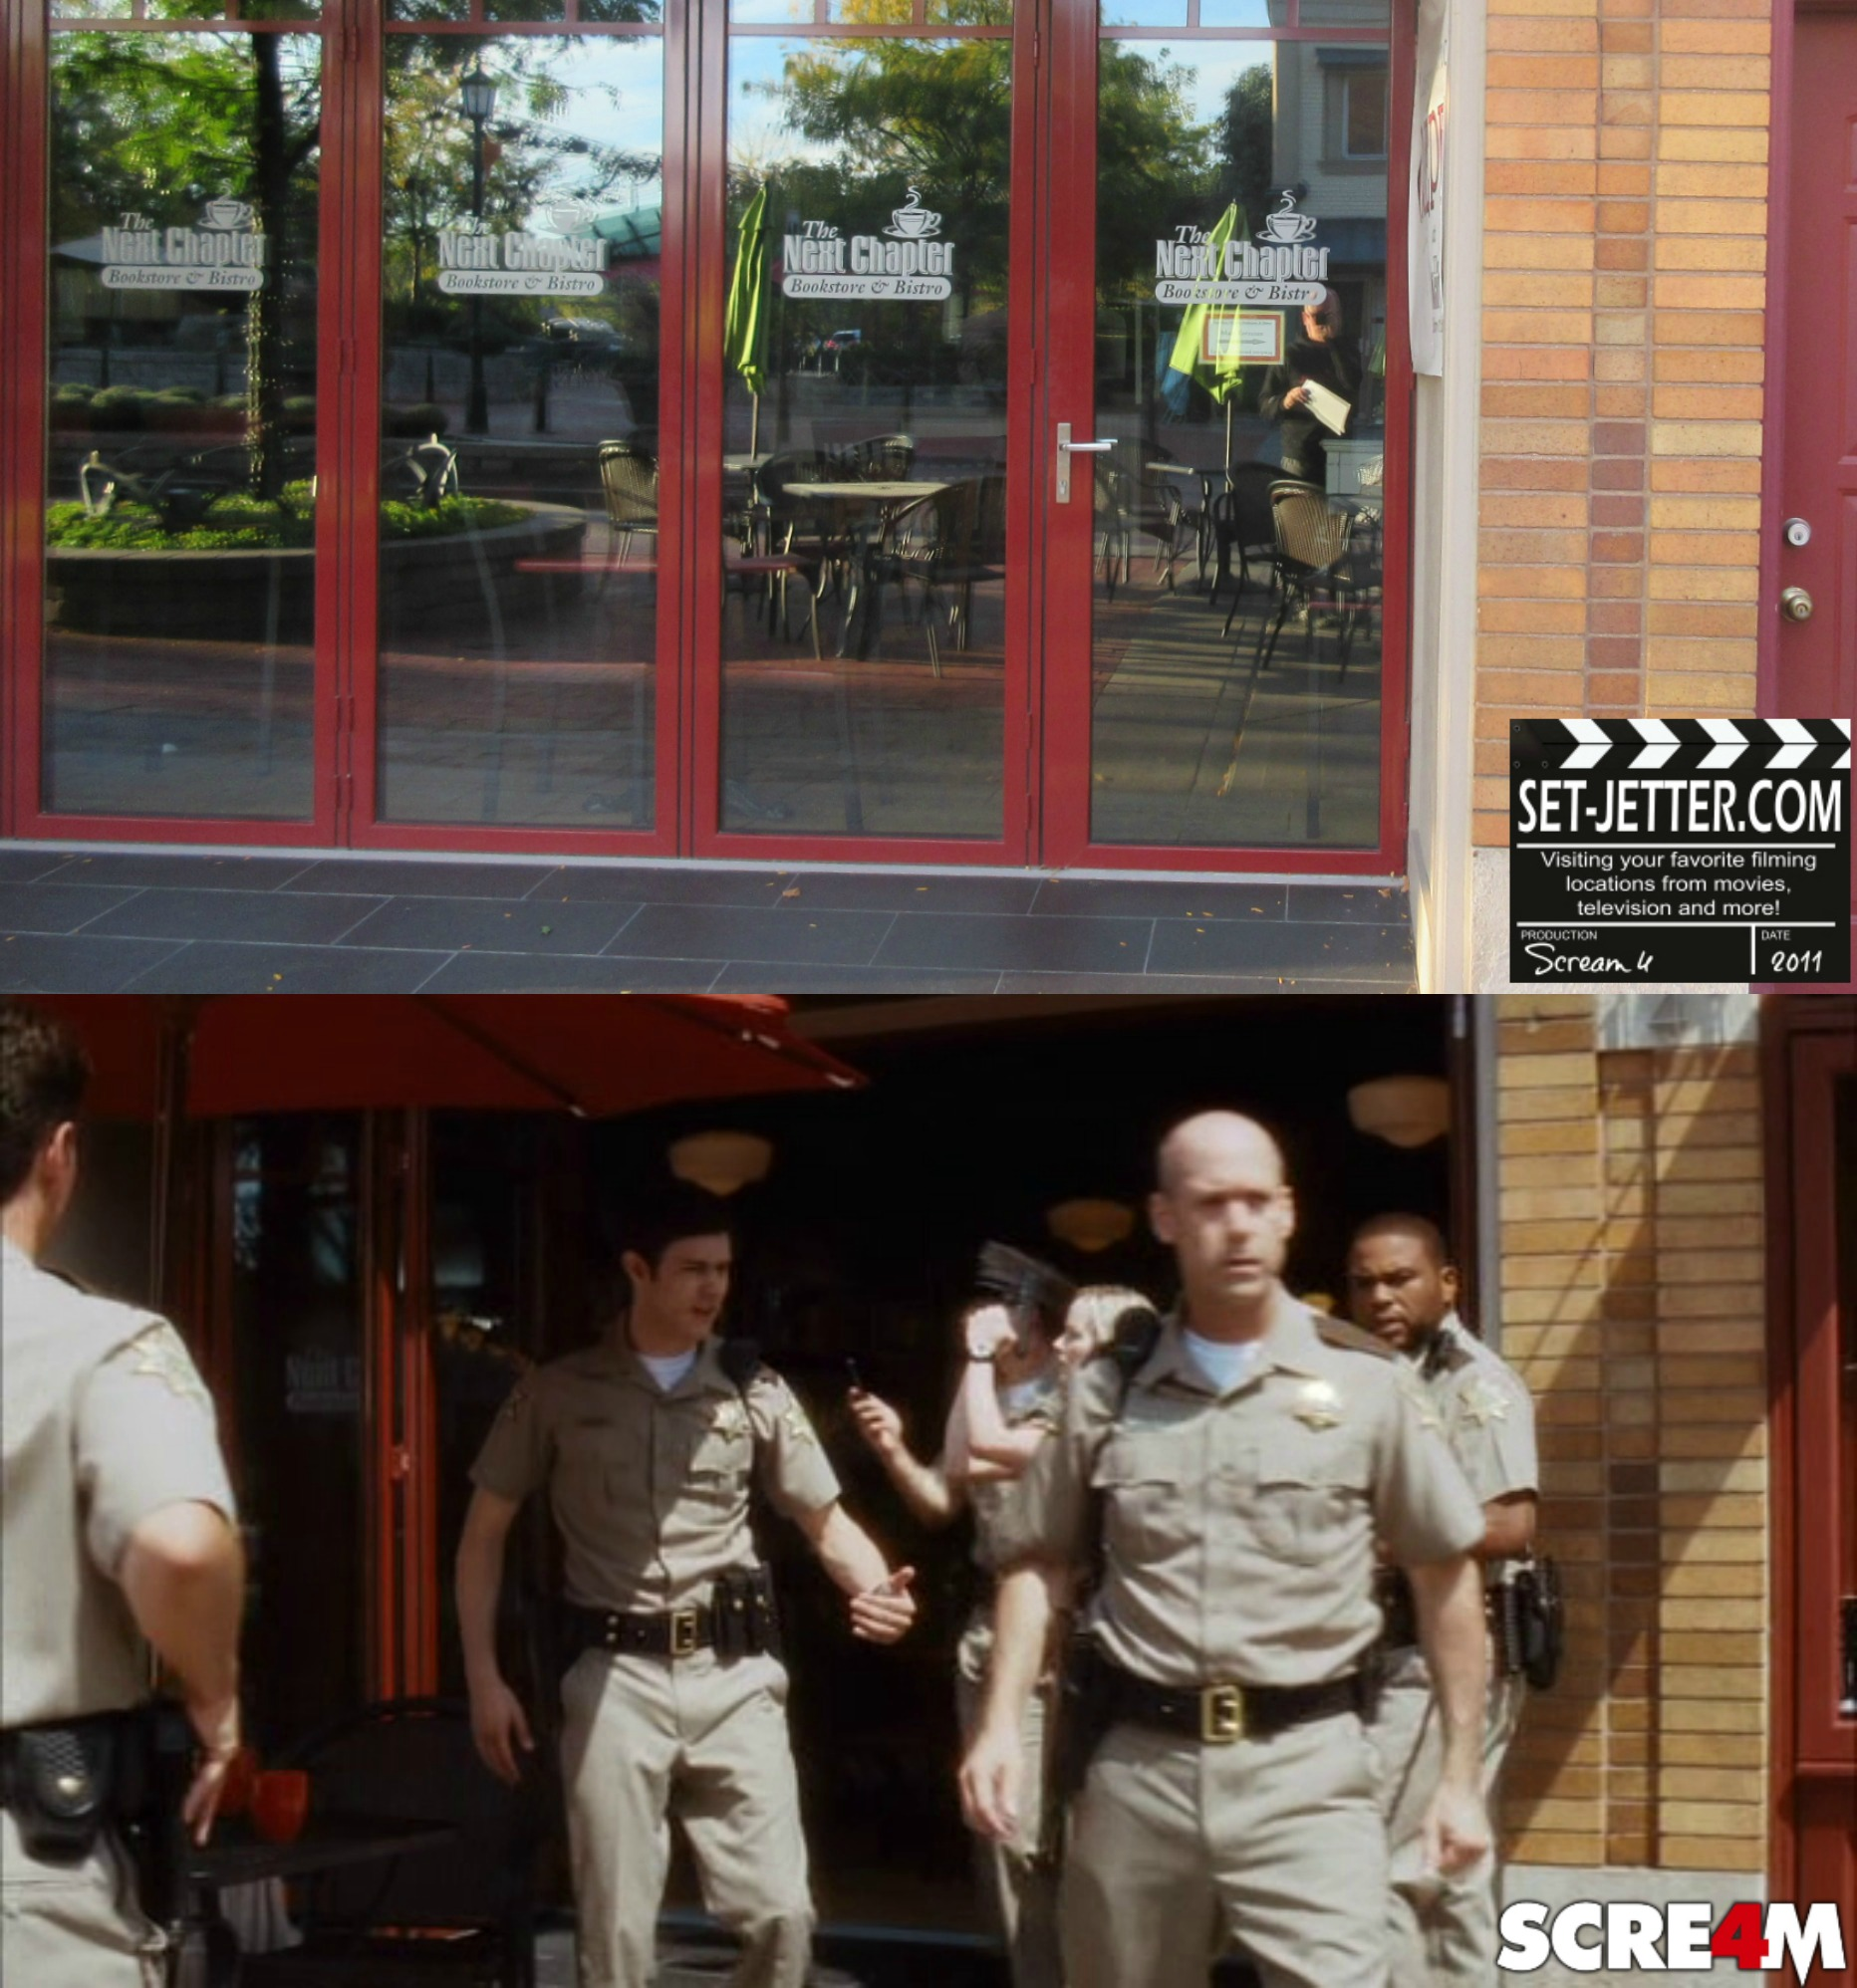 Scream4 comparison 76.jpg